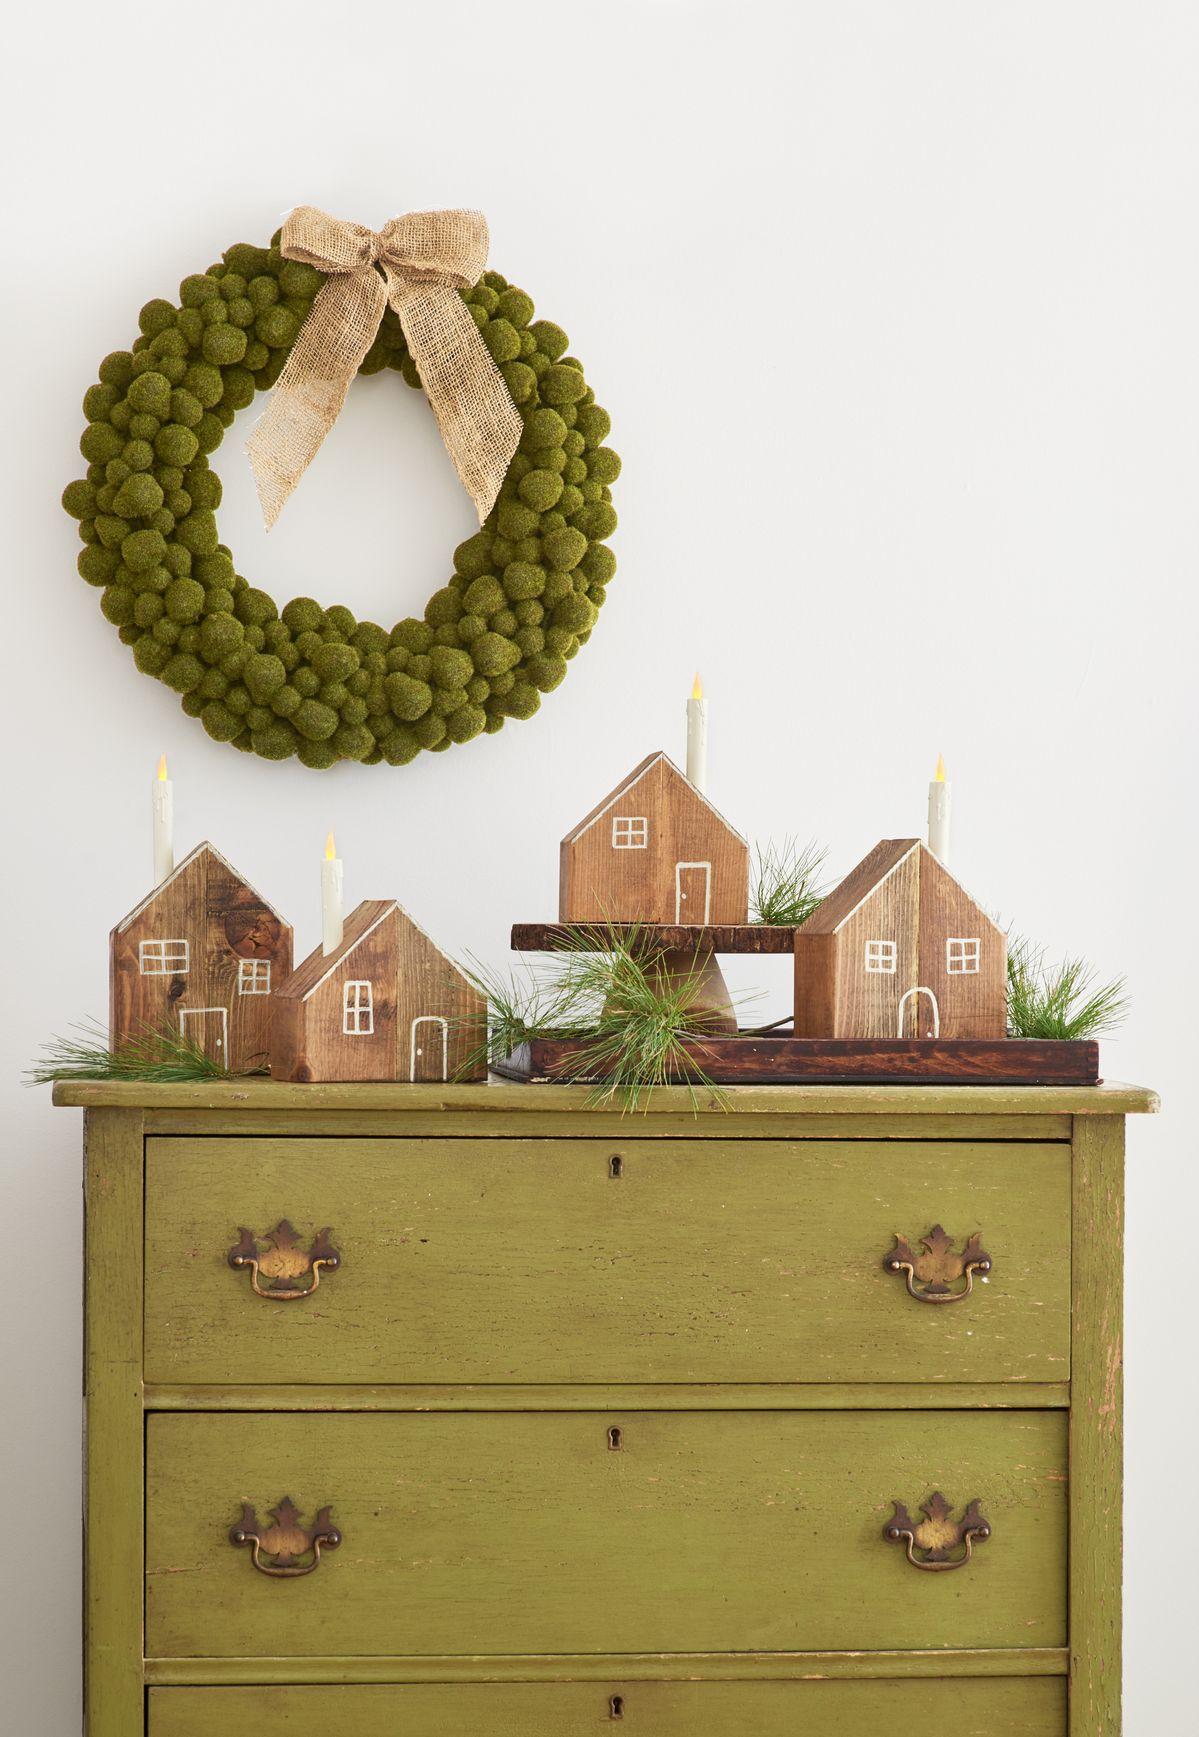 How to create festive wood-block luminaries.